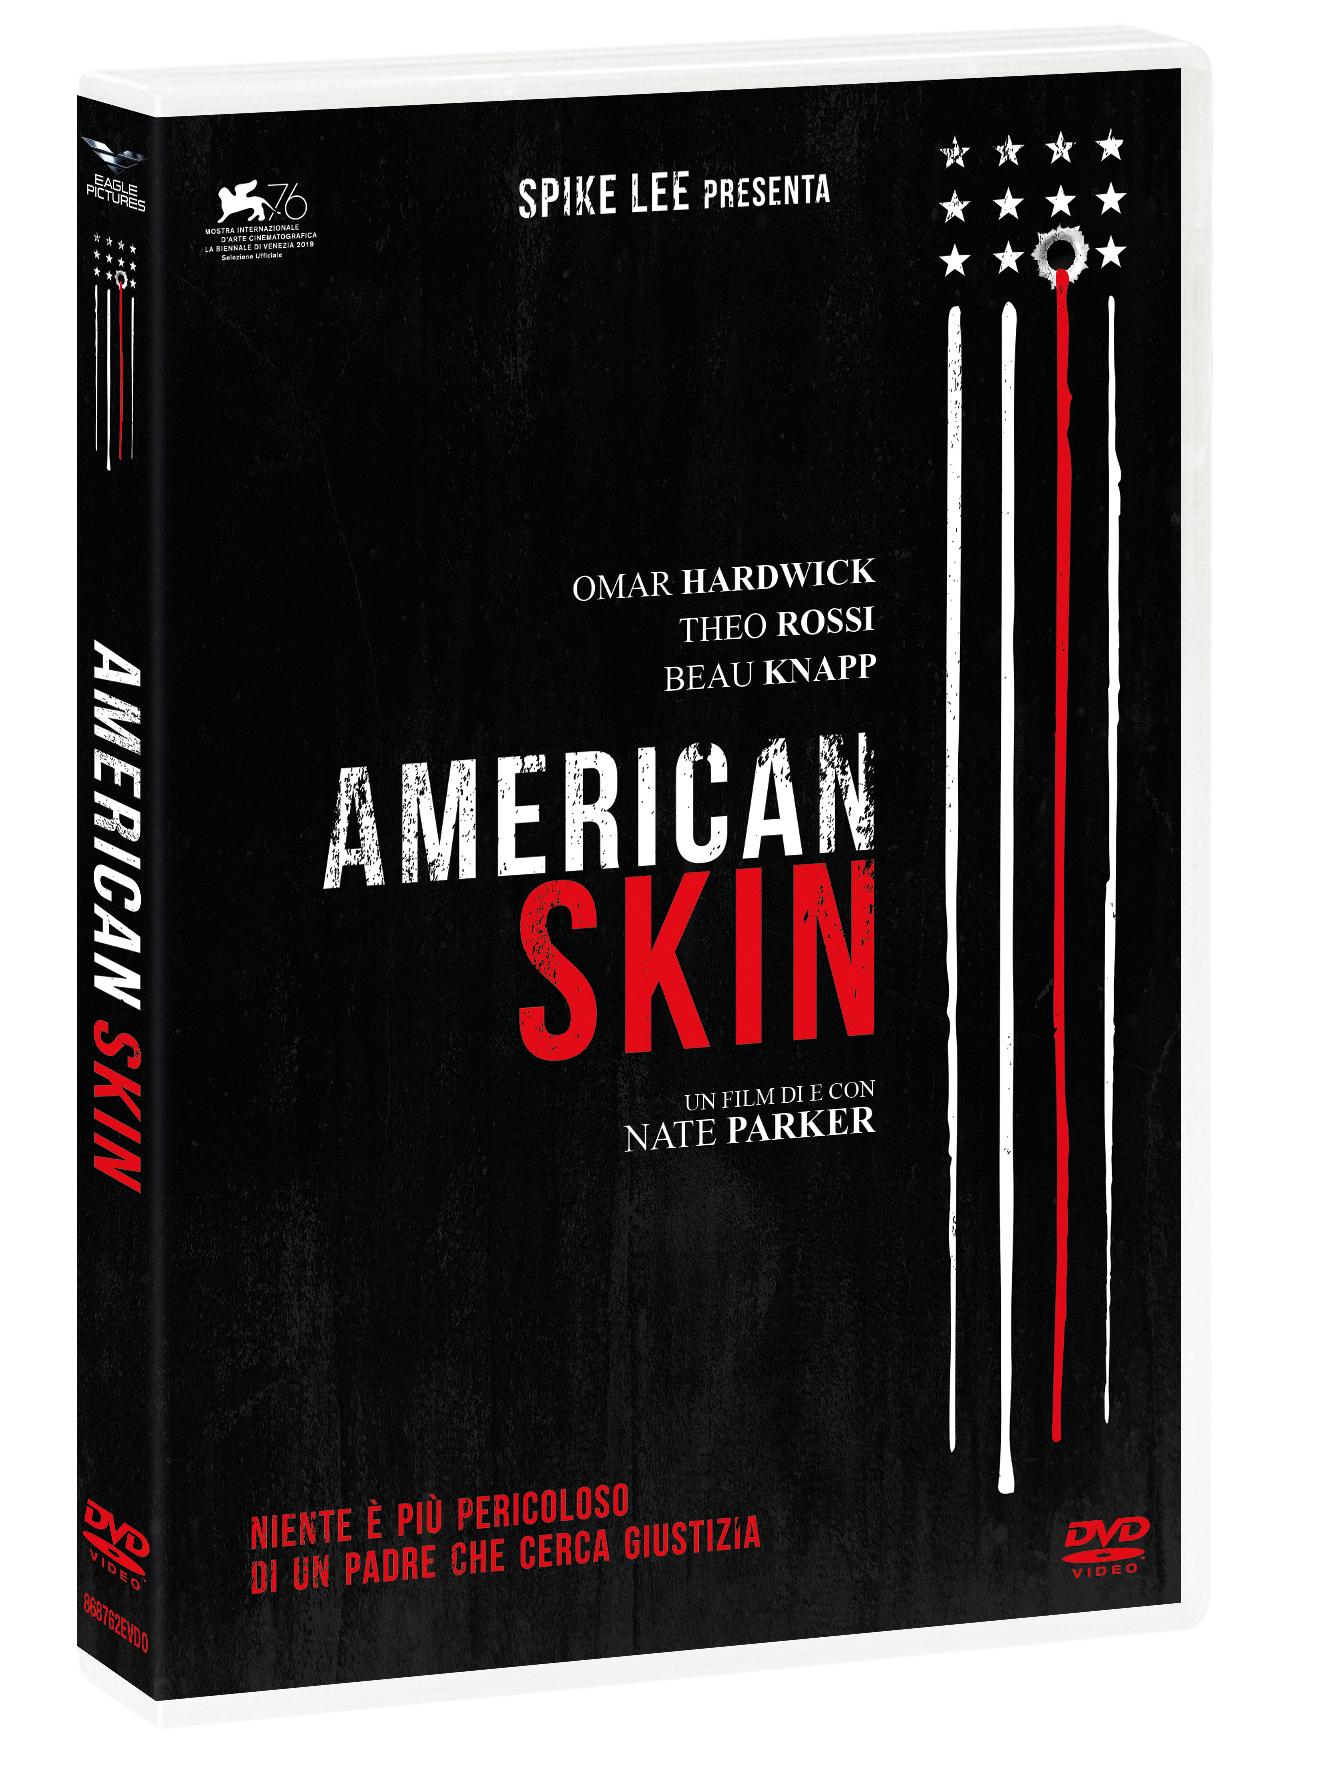 AMERICAN SKIN (DVD)